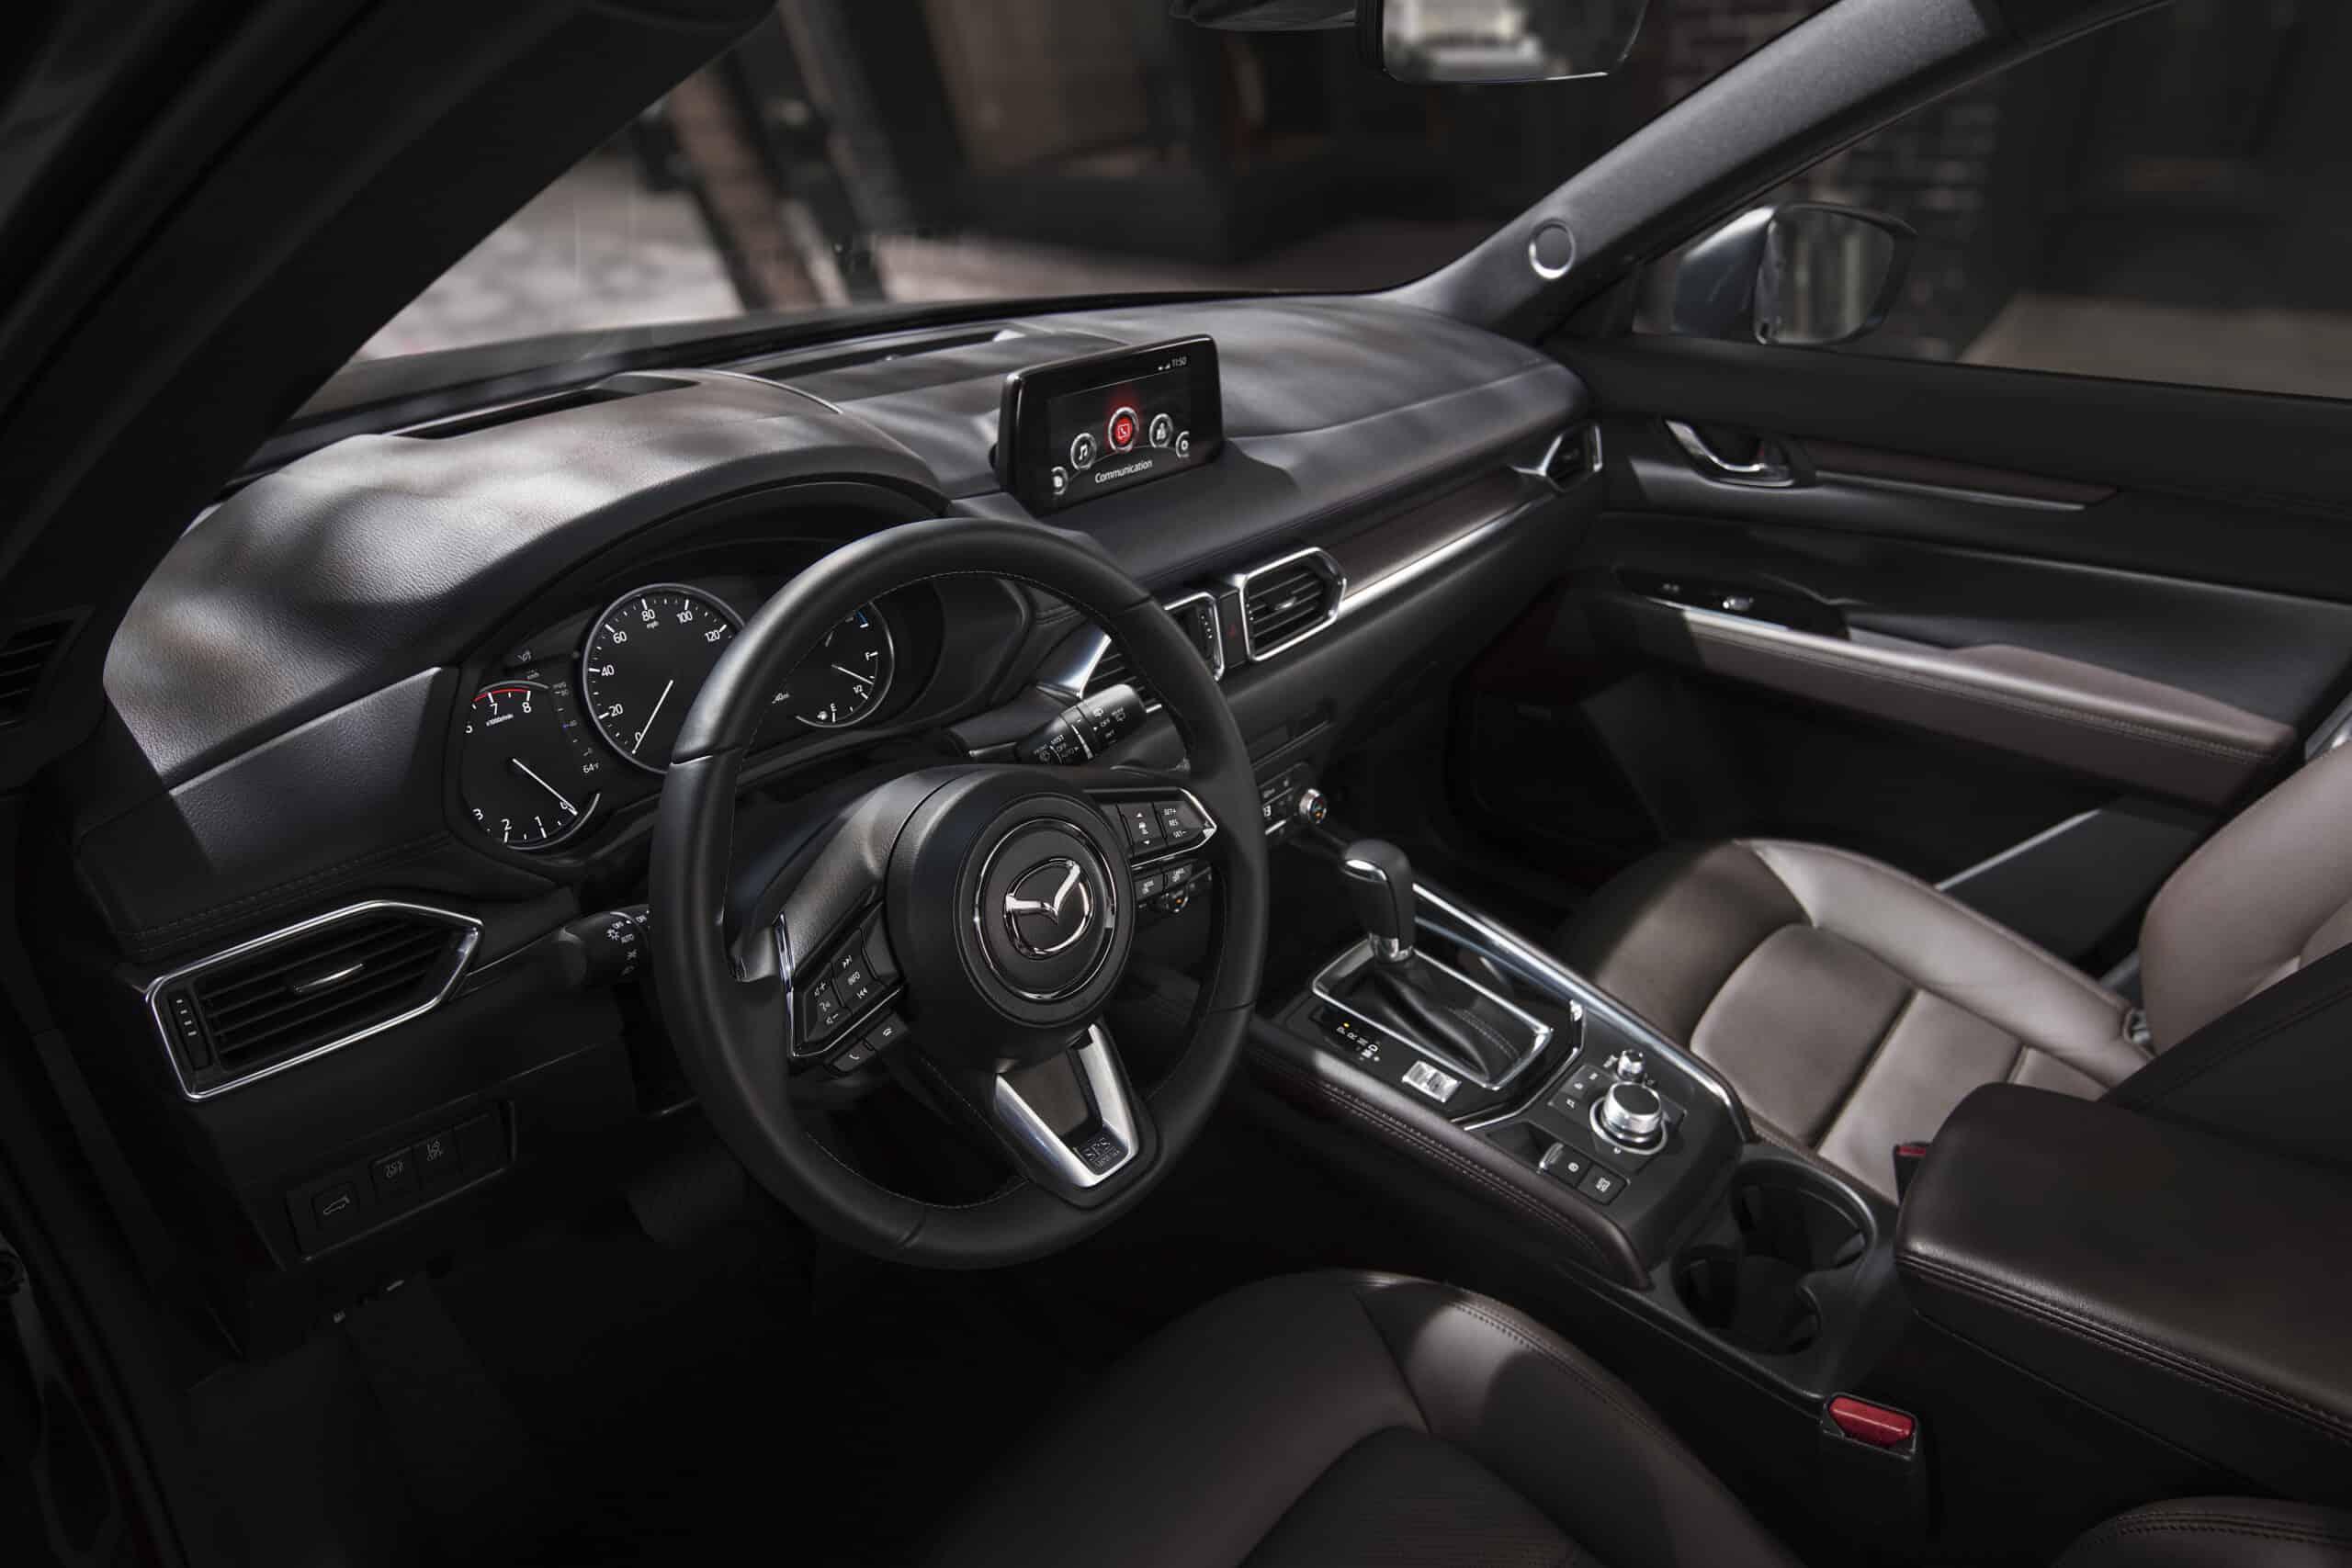 Tableau de bord du Mazda CX-5 2020